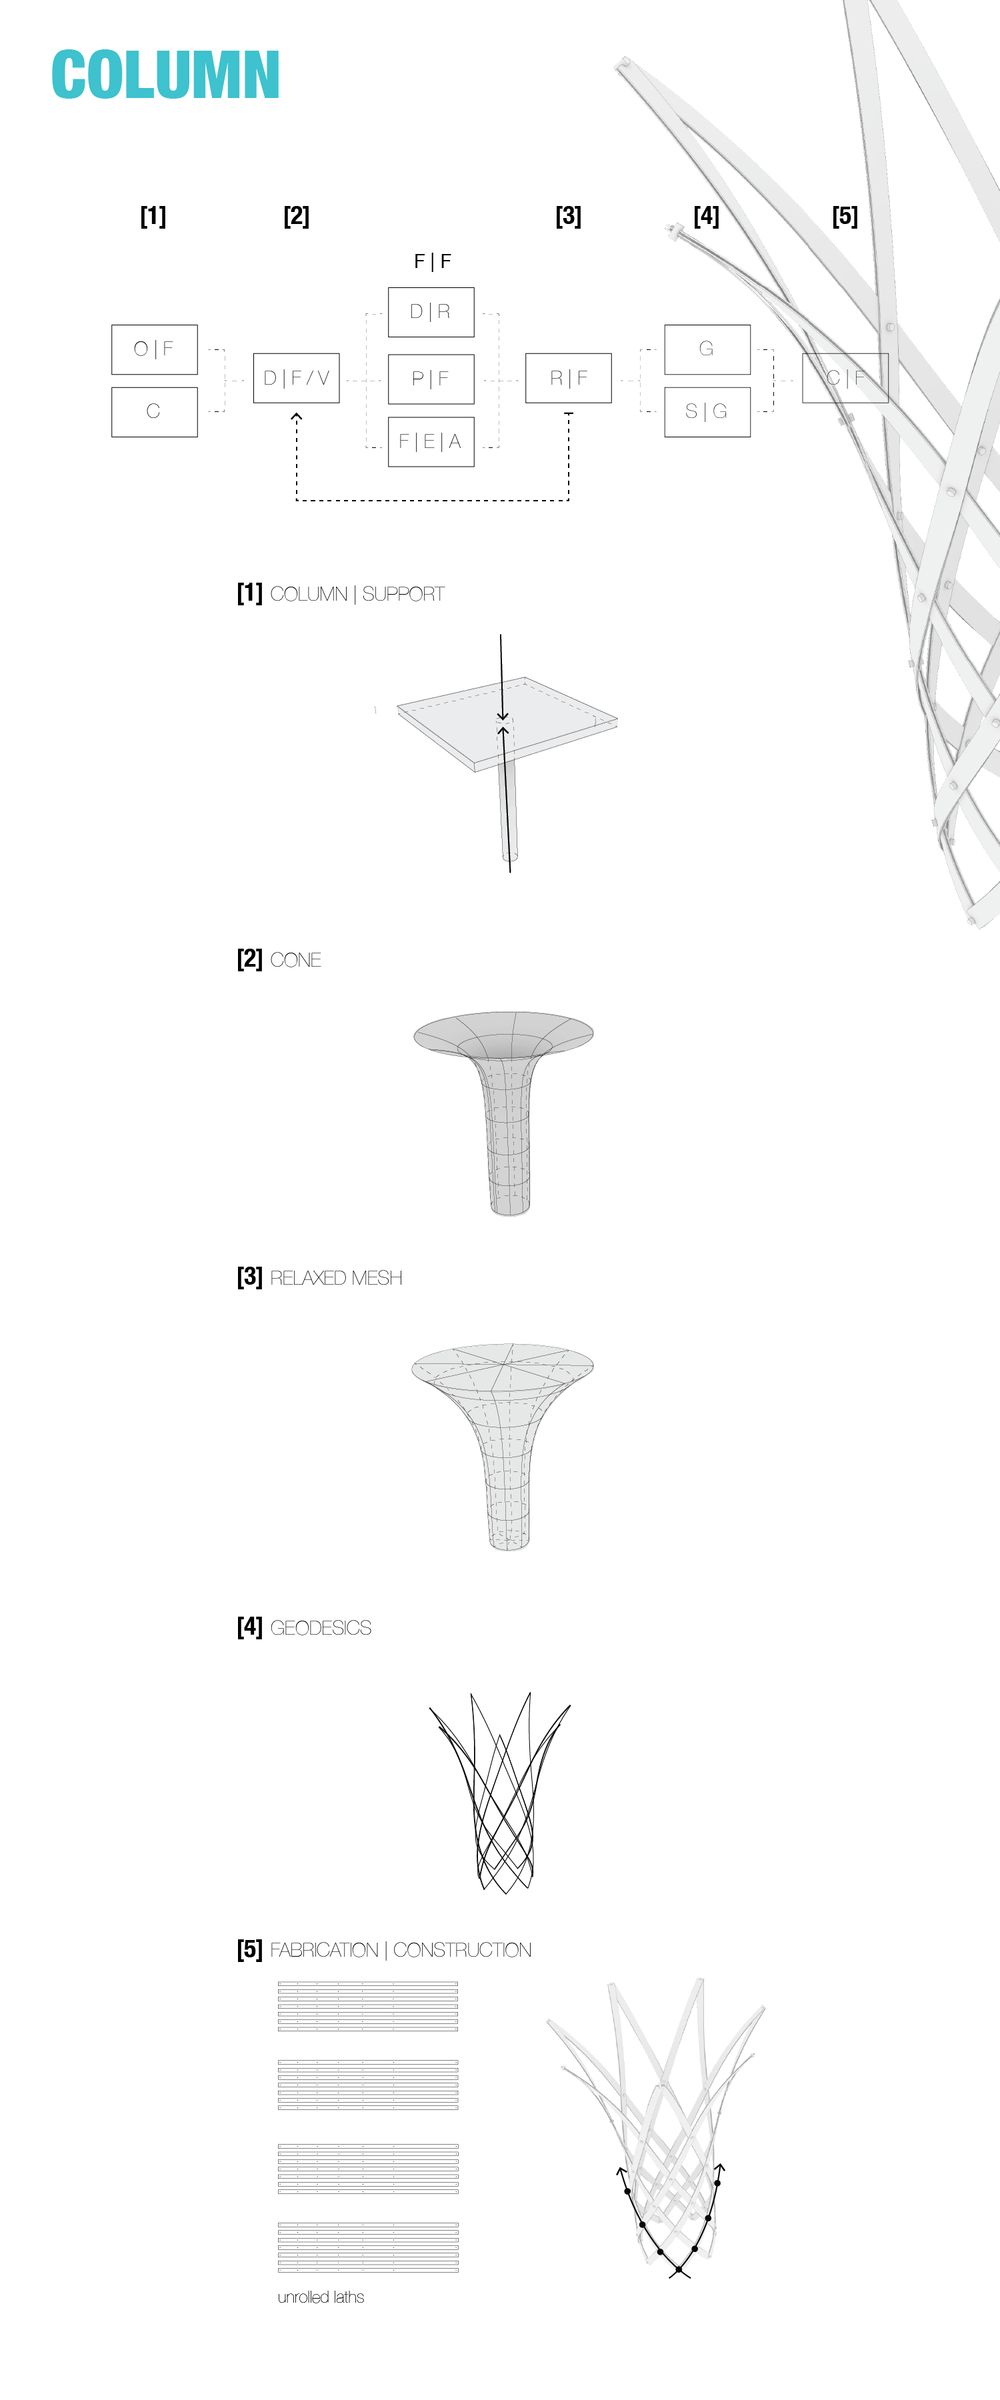 Full scale column model digital mockup